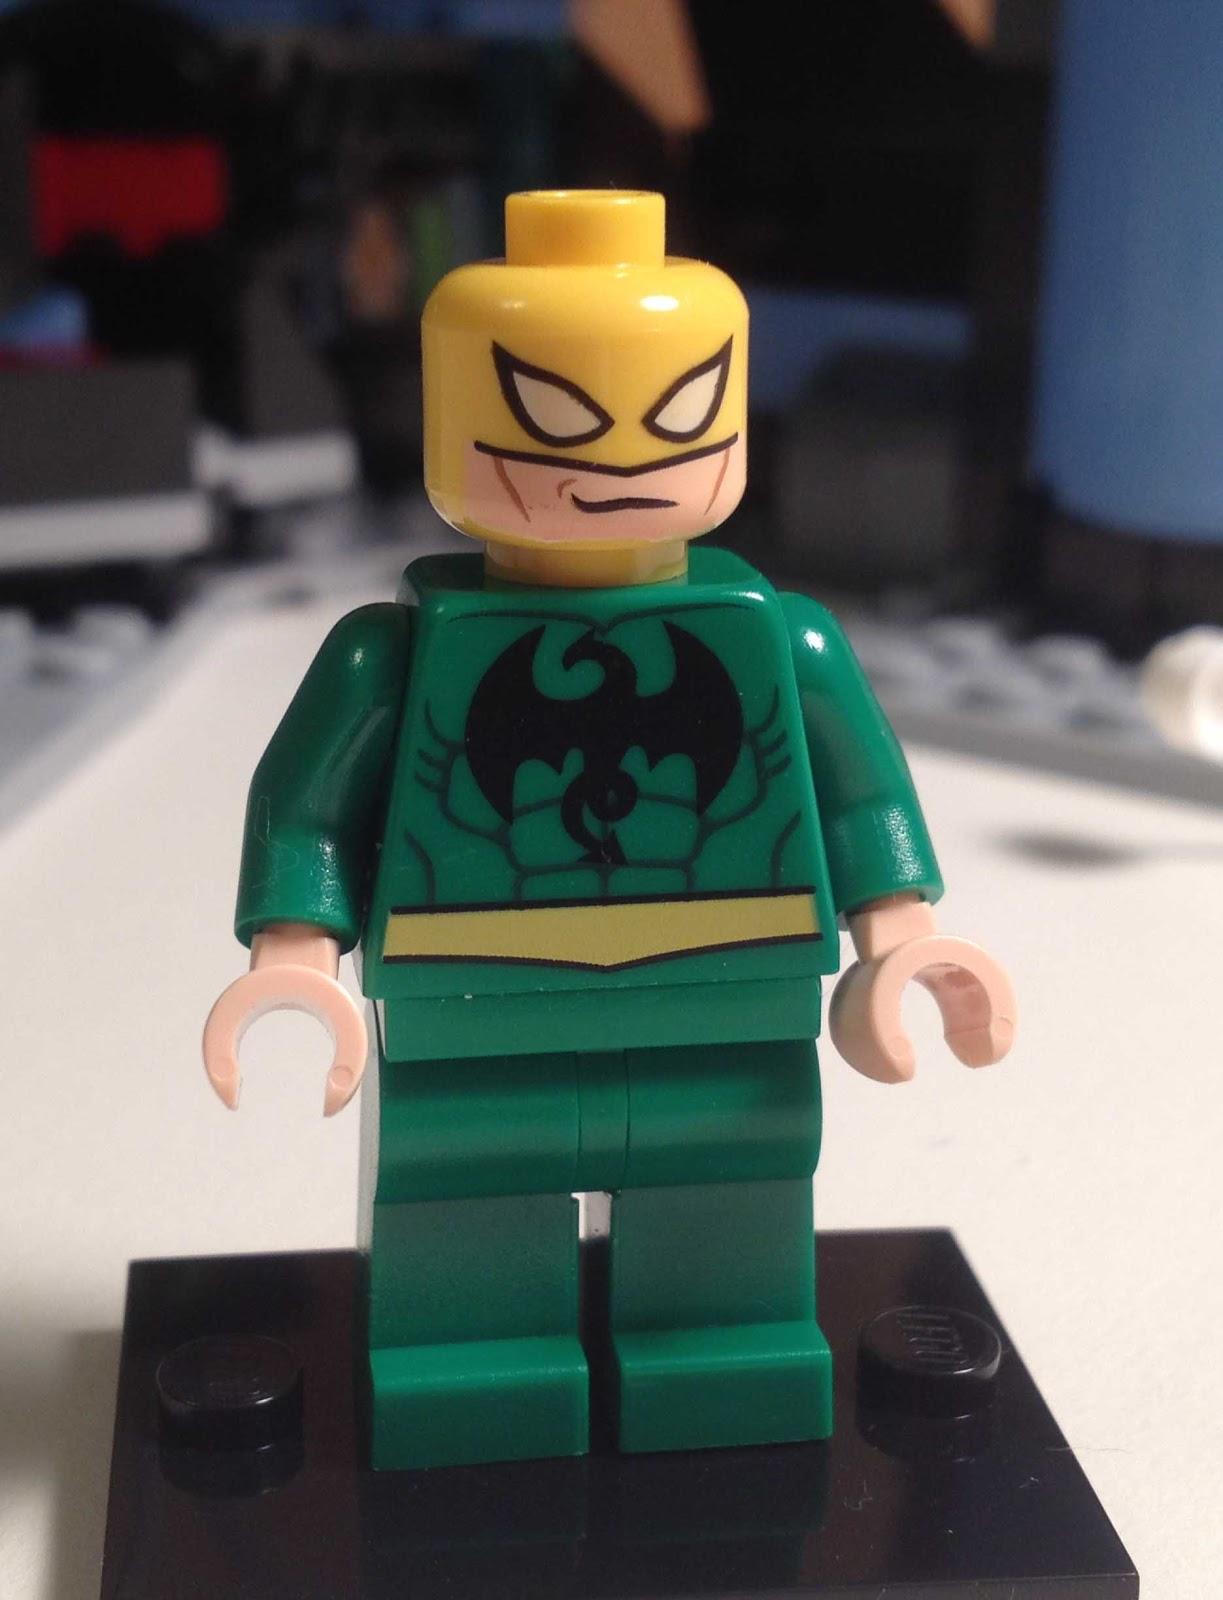 Wizbat DC Bricktober coltlbm23 FREEPOST LEGO Minifigure Batman Movie